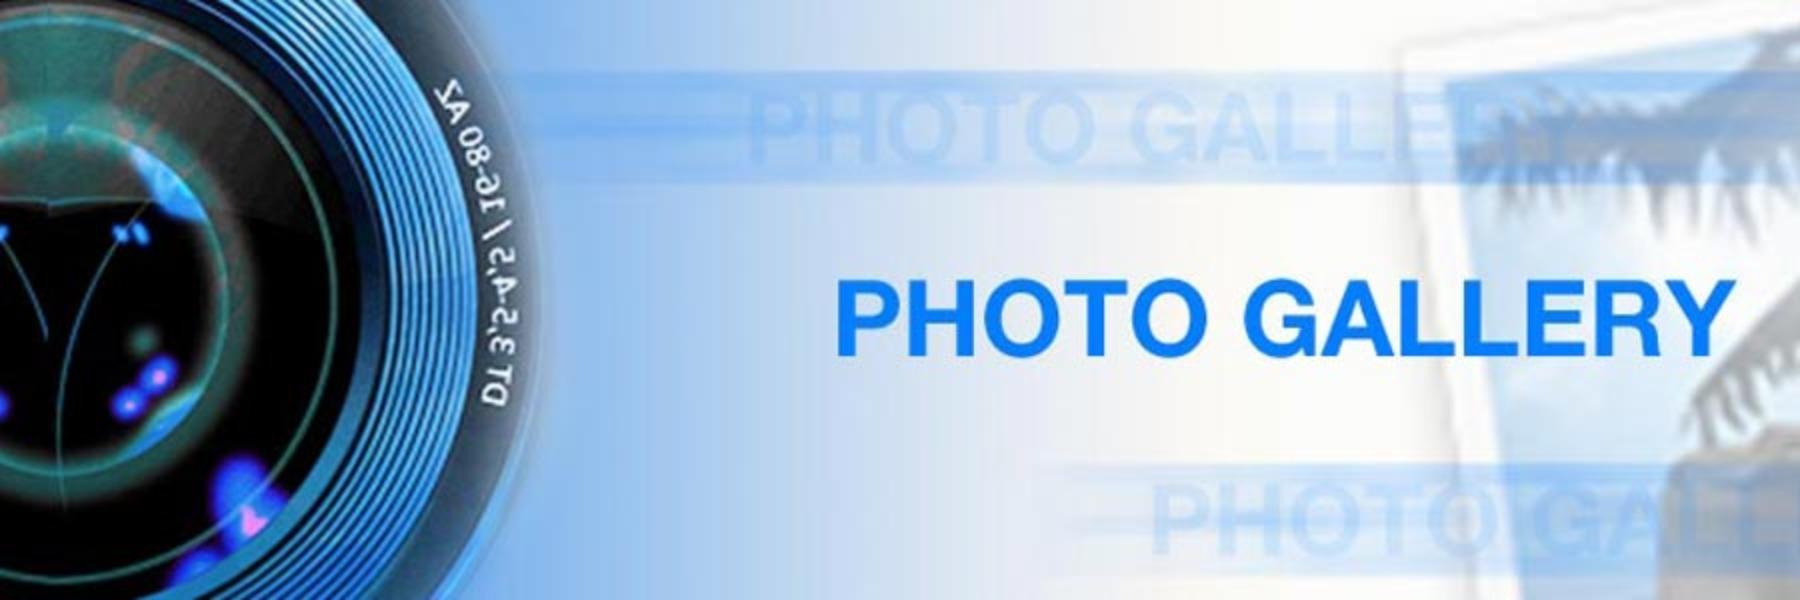 Photo Gallery (Picasa)